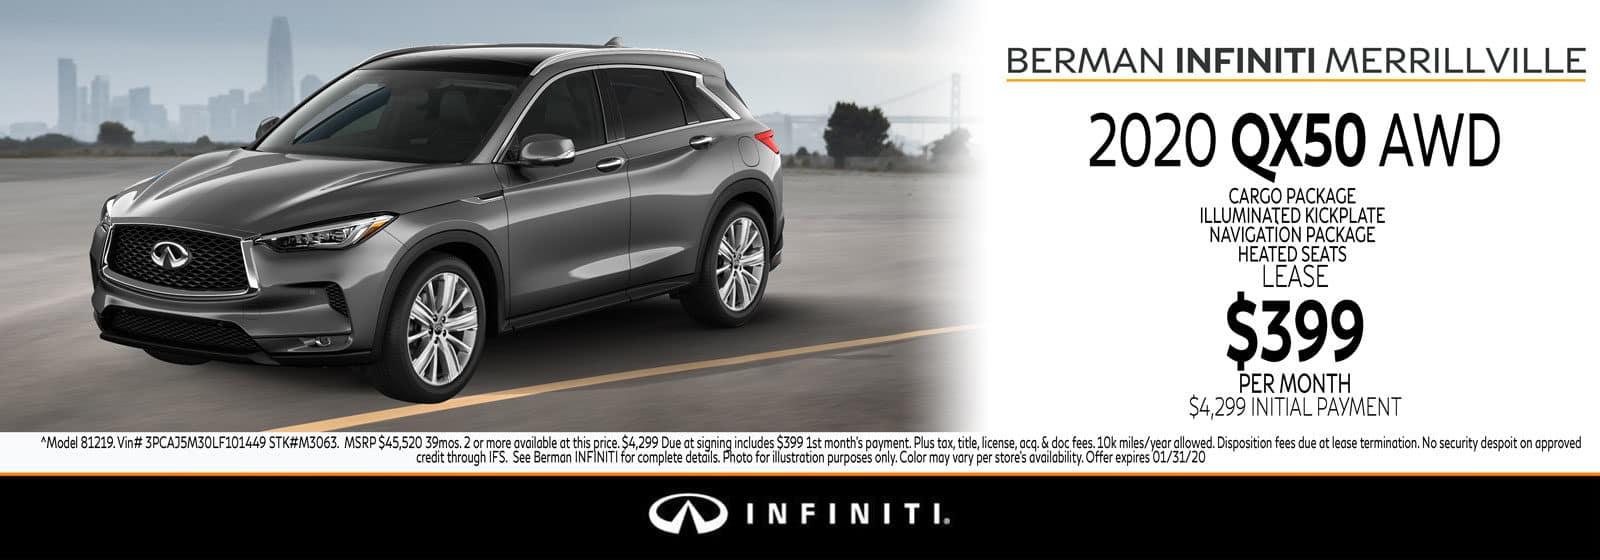 New 2020 INFINITI QX50 January Offer at Berman INFINITI of Merrillville!